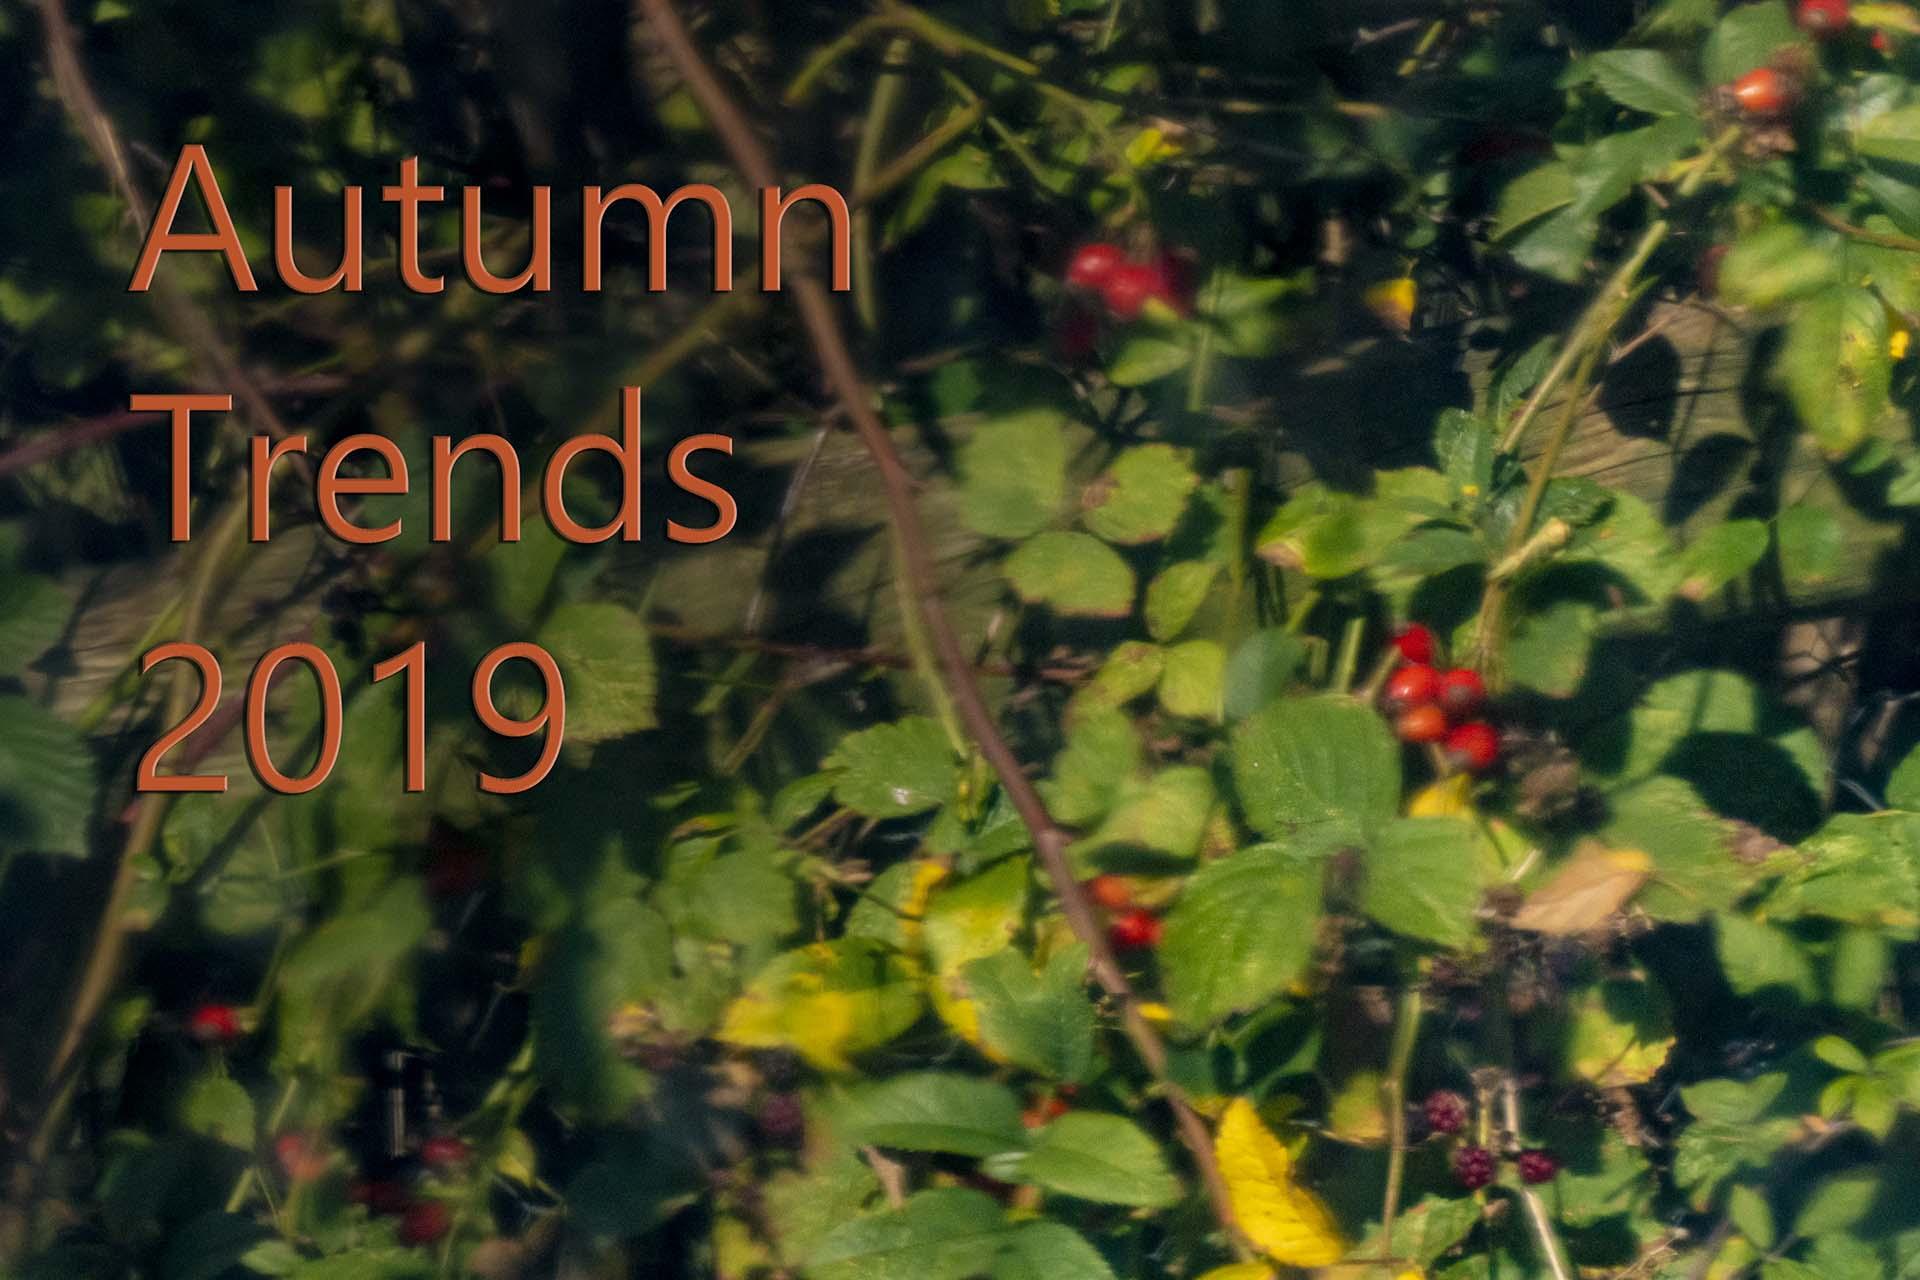 autumn trends 2019 kitchen worktops reflection black pearl granite rose hips red